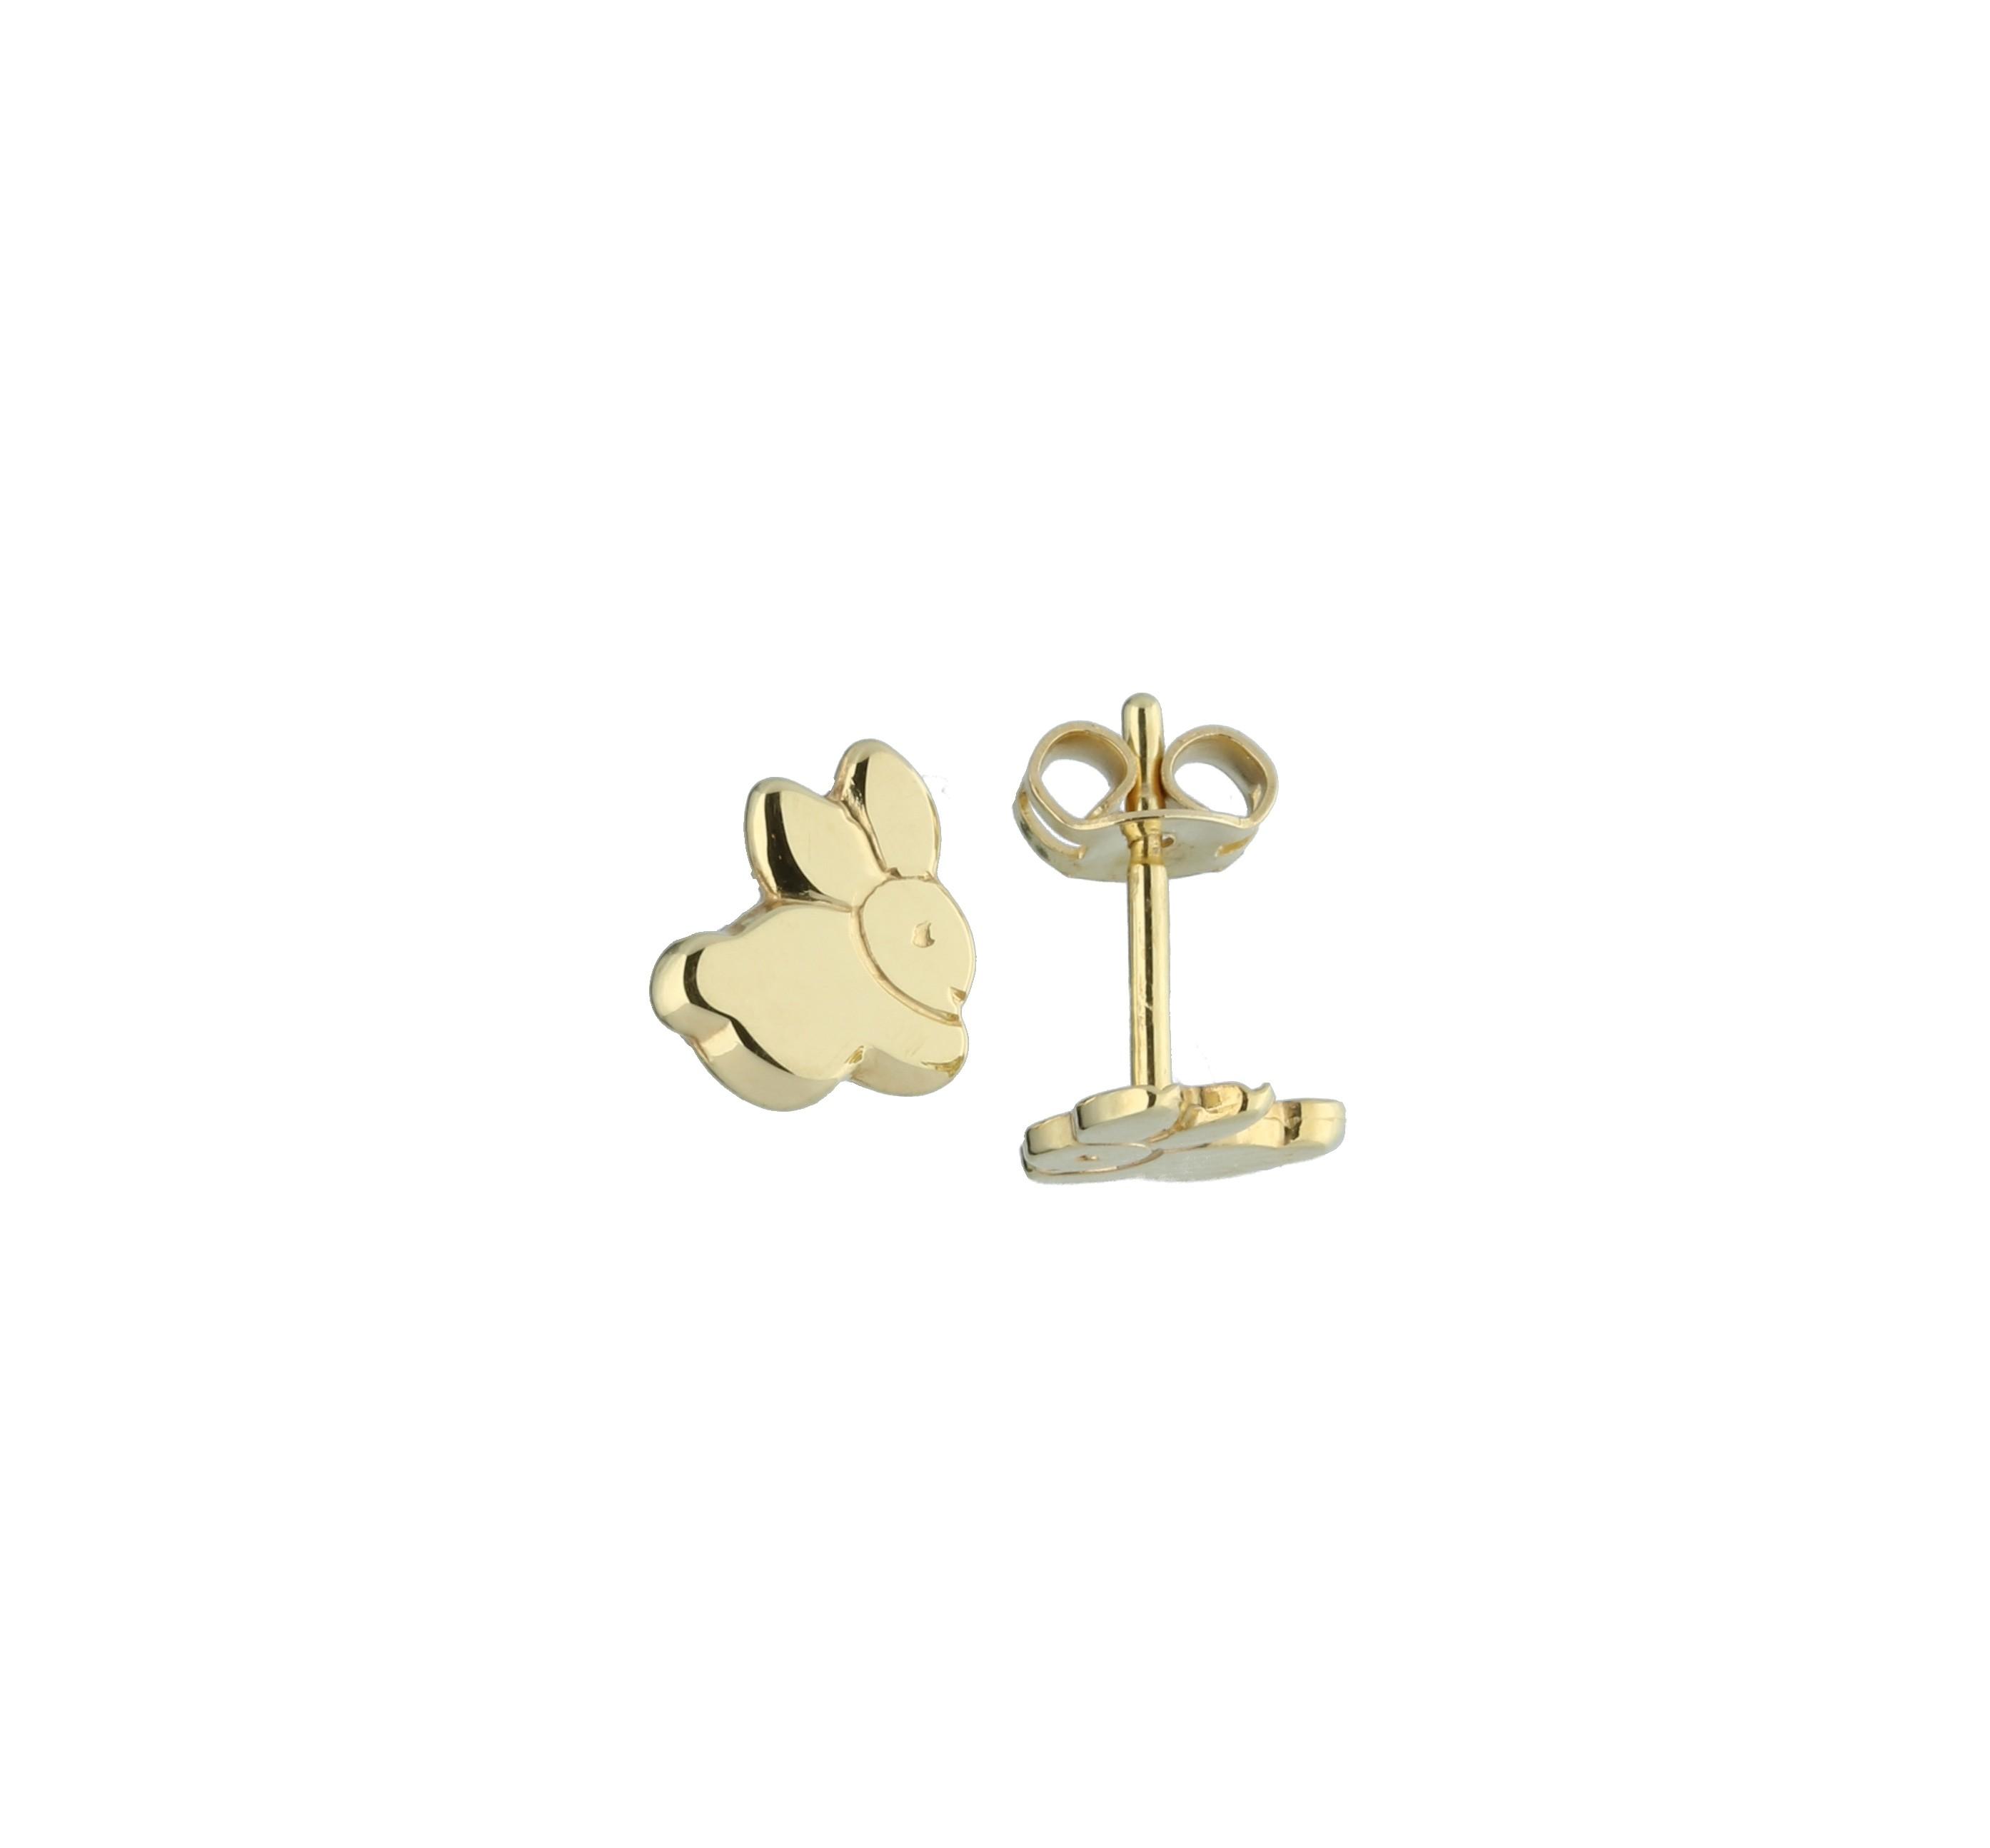 Glow Gouden Kinderoorknopjes - Konijn  206.0485.00